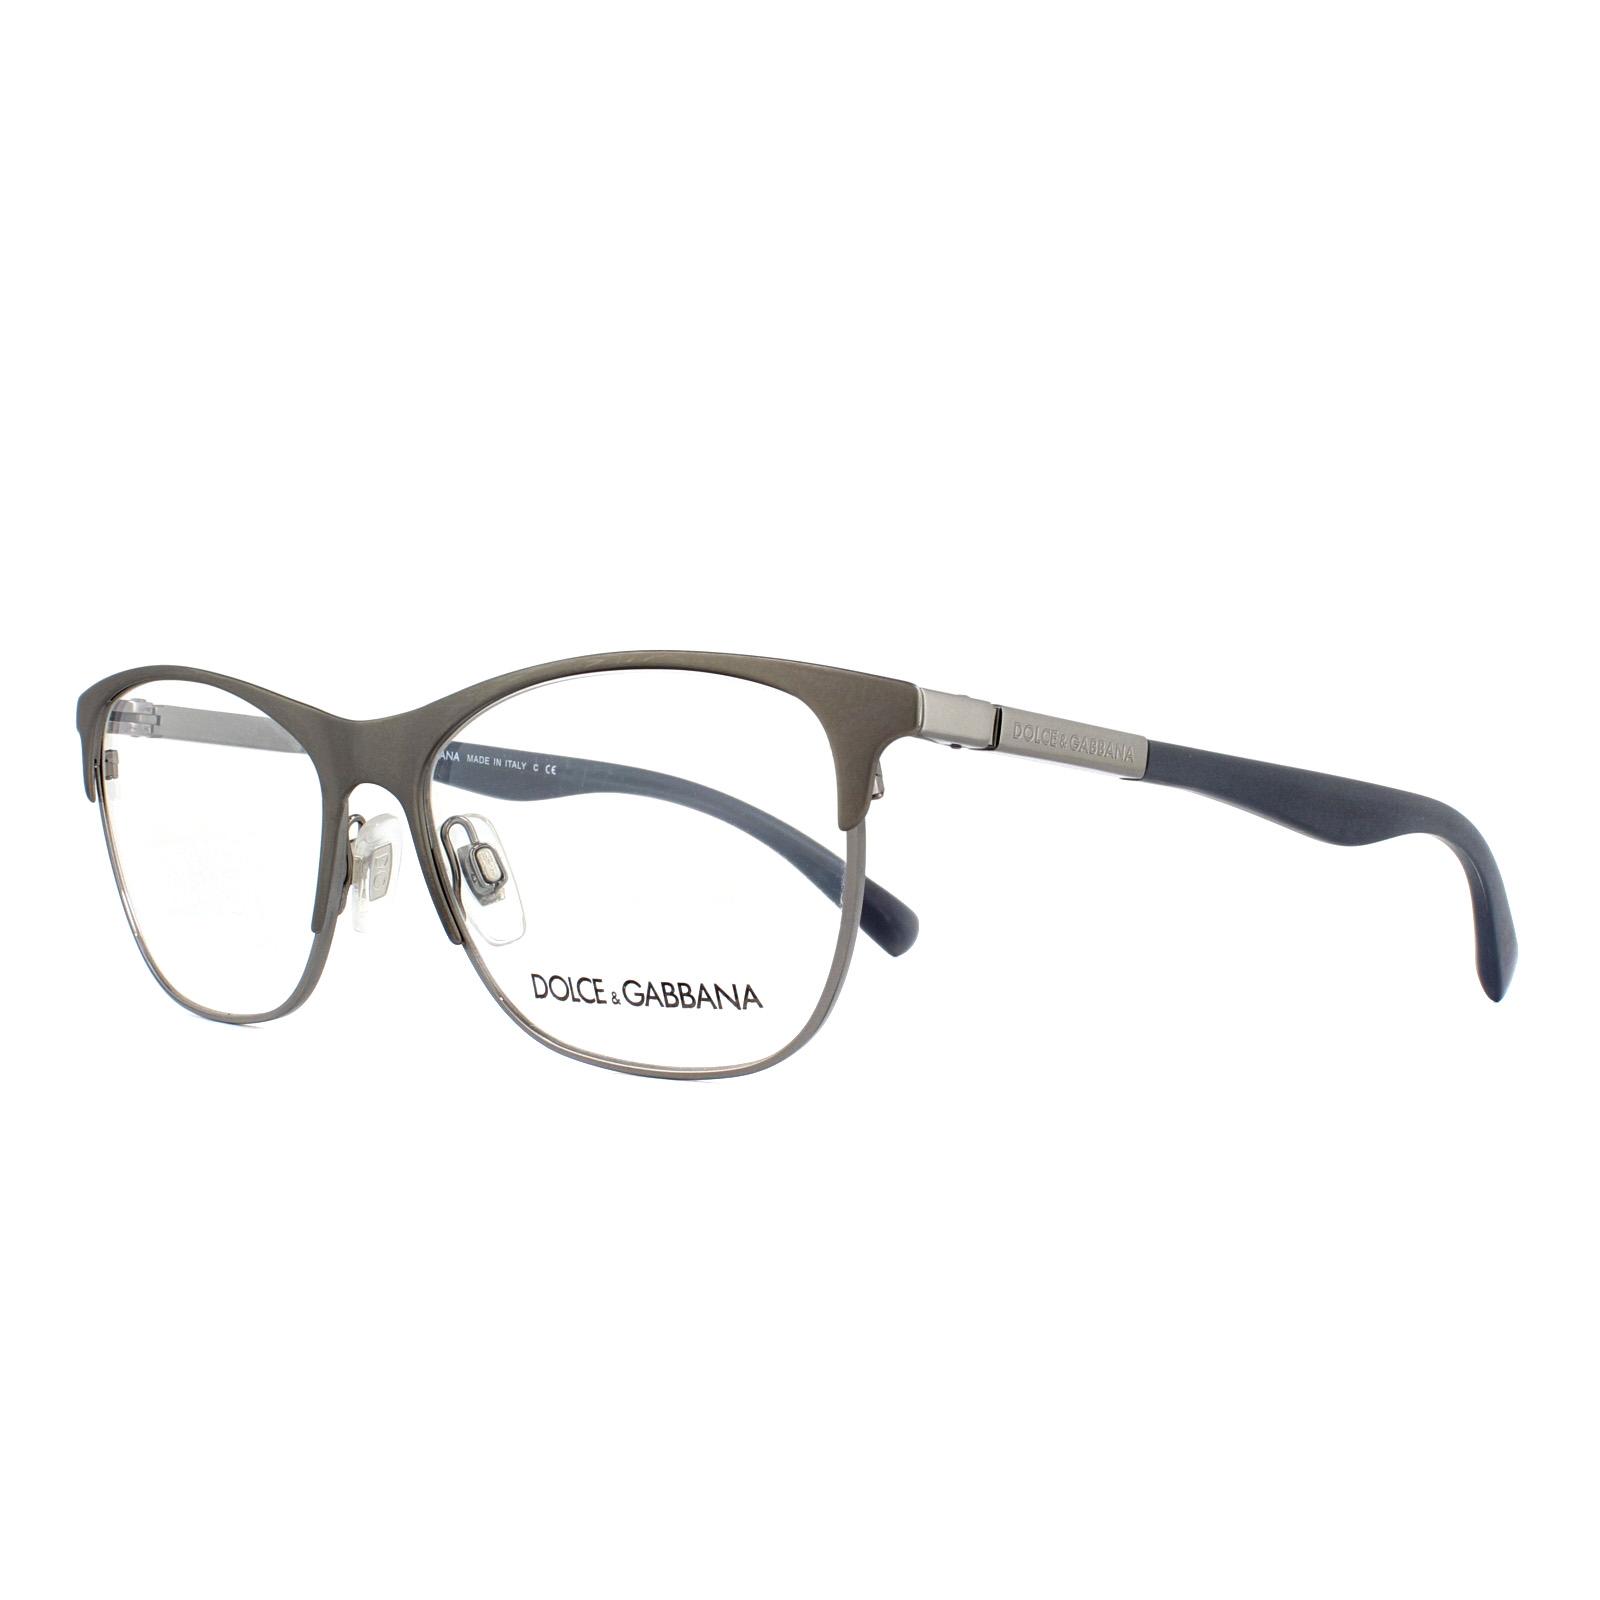 afe02bf4a47 Sentinel Dolce   Gabbana Glasses Frames DG 1246 1221 Matt Gunmetal 53mm  Womens